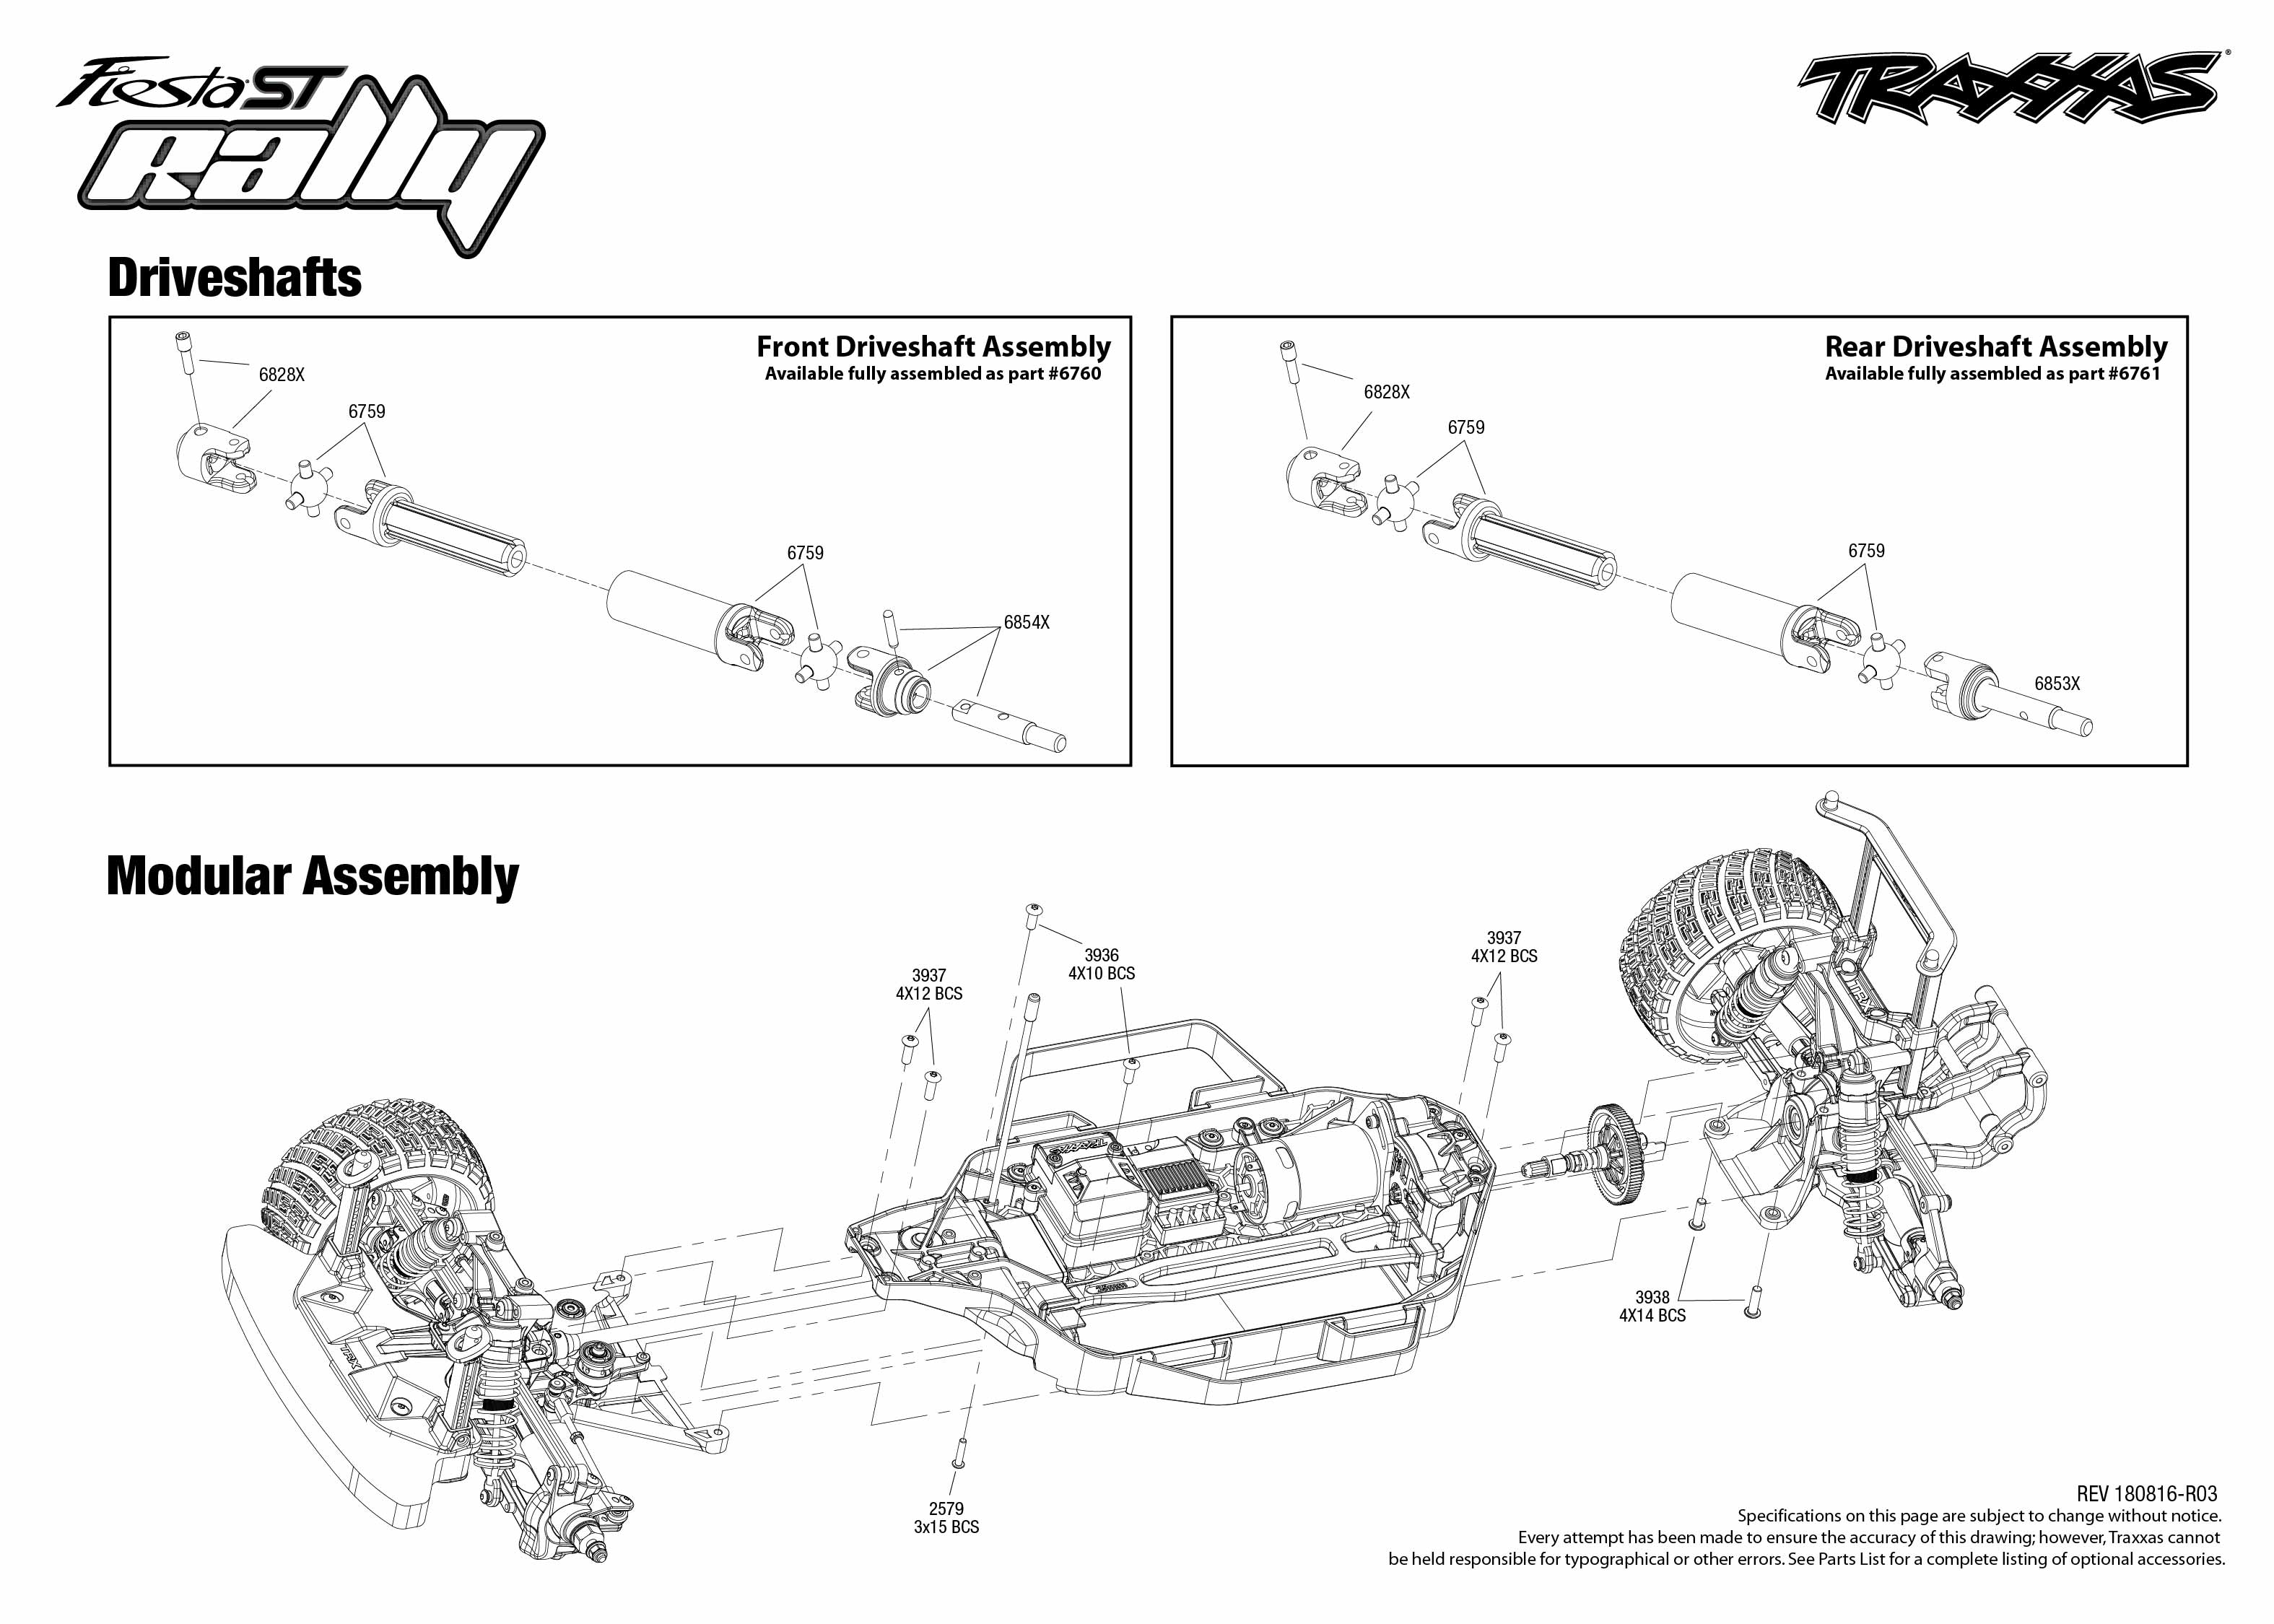 2014 Ford Fiesta Engine Diagram Printable Worksheets And